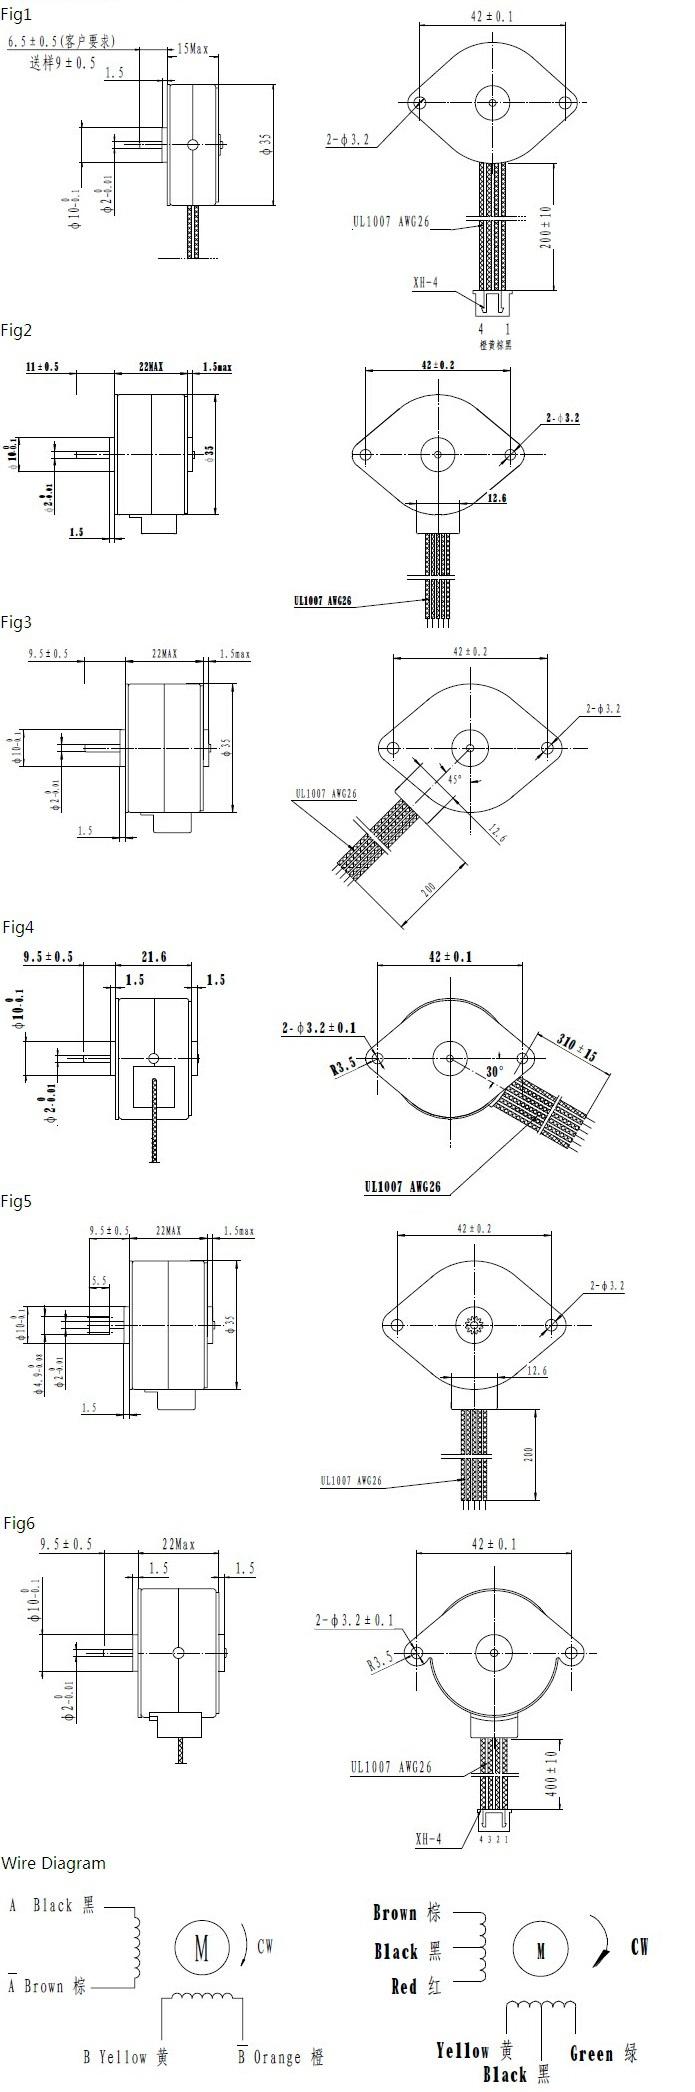 hight resolution of 92 sportster wiring diagram 92 free engine image for harley sportster carburetor motorcycle fuel line